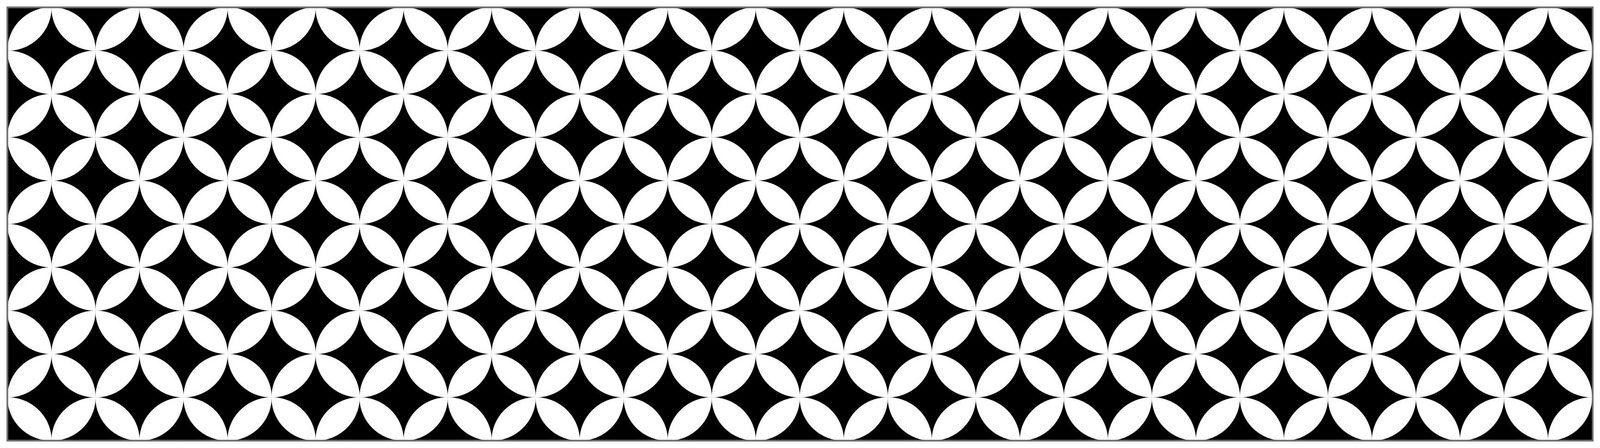 Küchenrückwand - Spritzschutz »profix«, Chadi Grafik, 220x60 cm - broschei